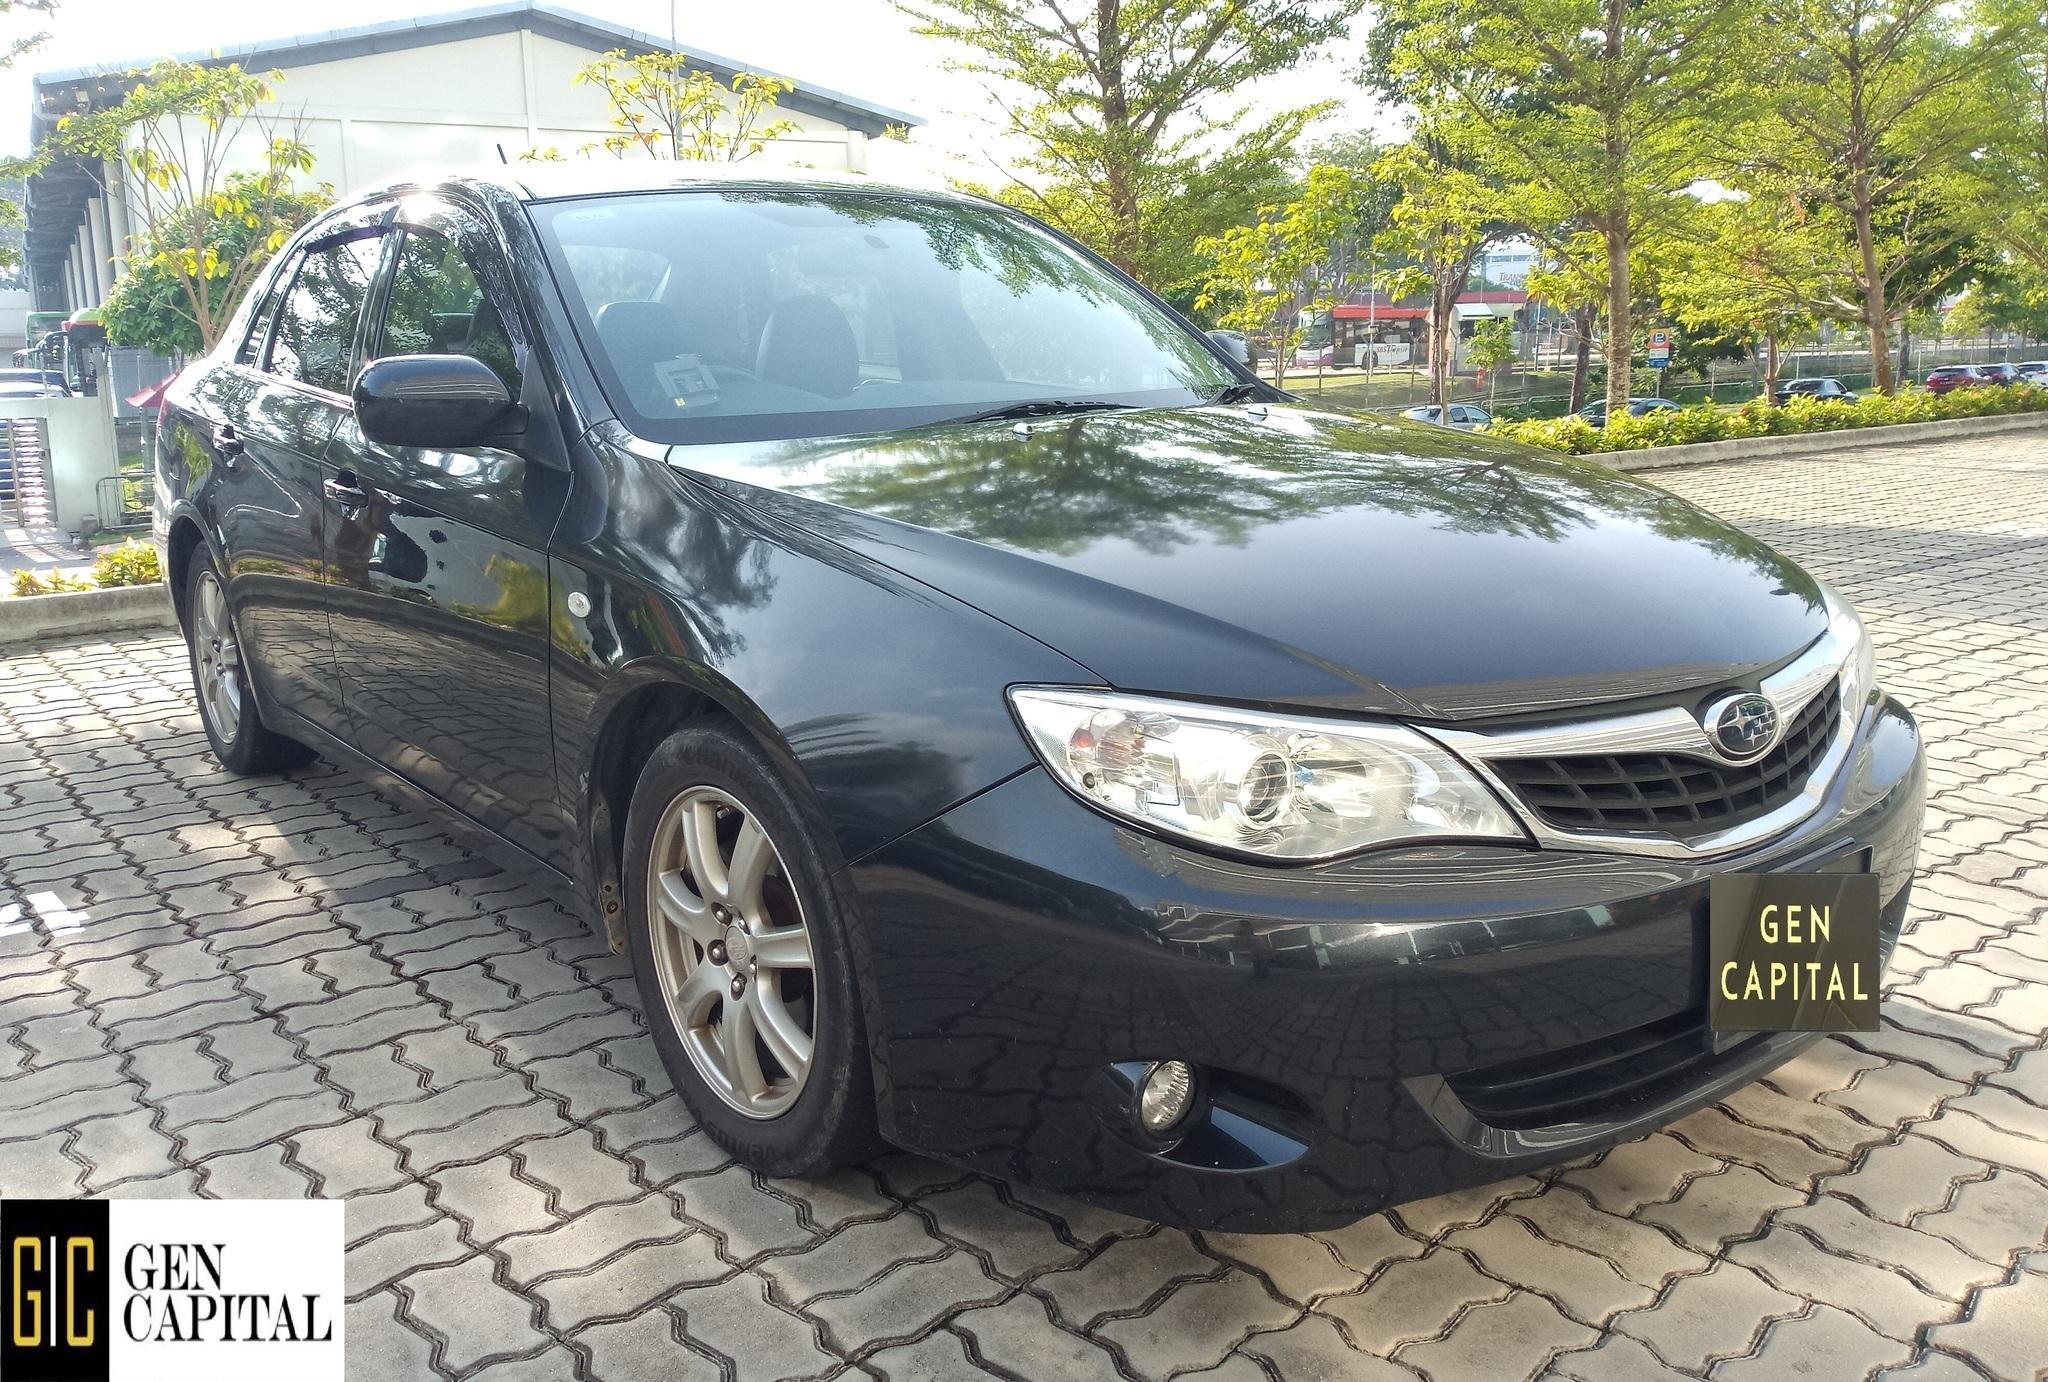 Subaru Impreza 1.5A AWD Comfortable Car for Personal & PHV Usage